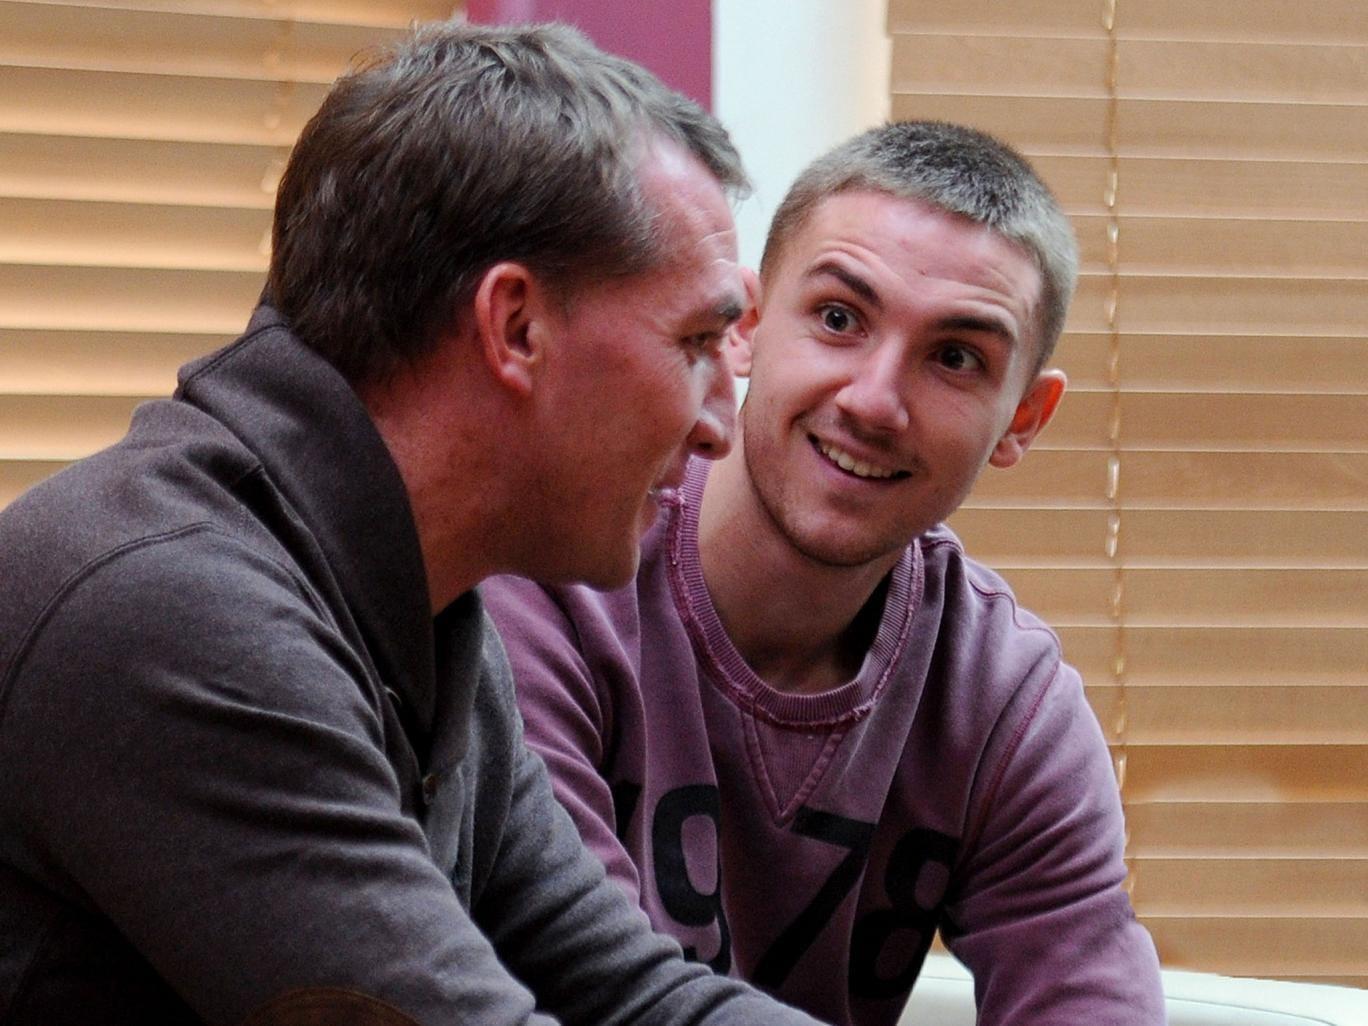 Brendan Rodgers with son Anton